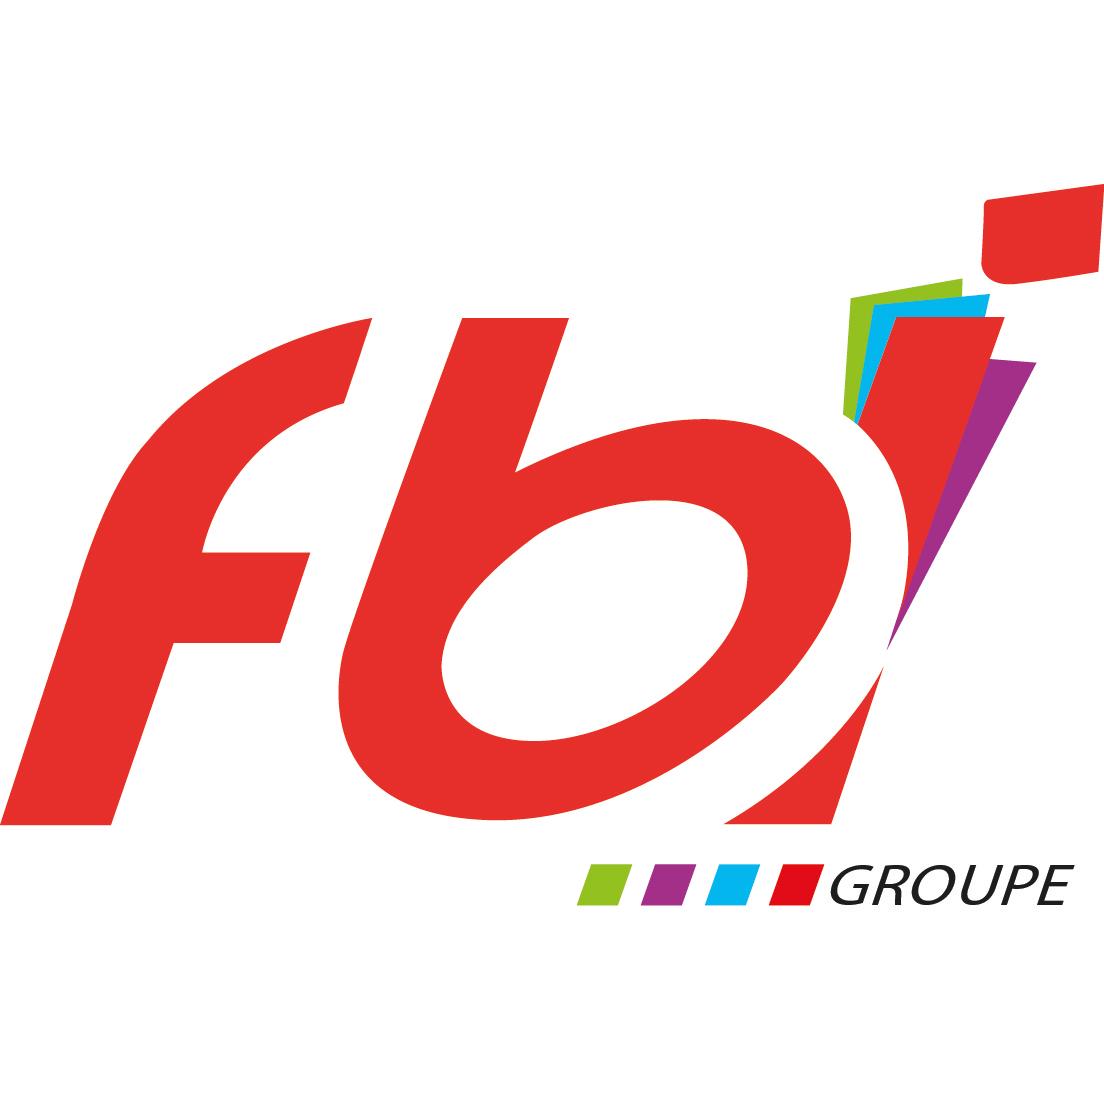 logo-fbi-imprimerie-burinter-pierrelatte